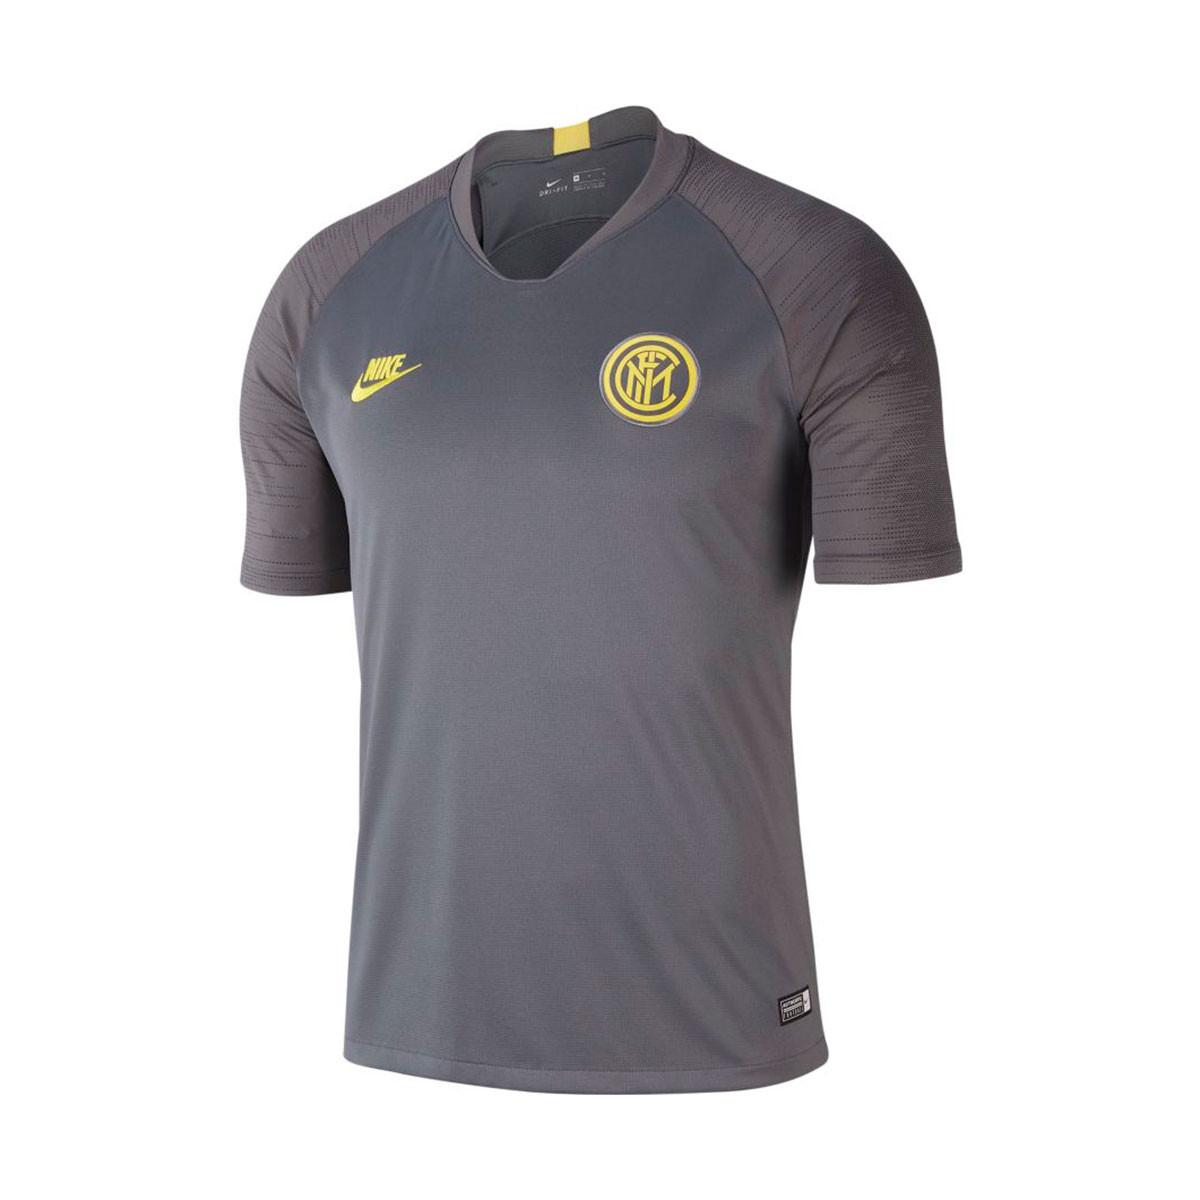 newest 165a6 11007 Camiseta Inter Milan Milan Breathe Strike 2019-2020 Dark  grey-Anthracite-Tour yellow